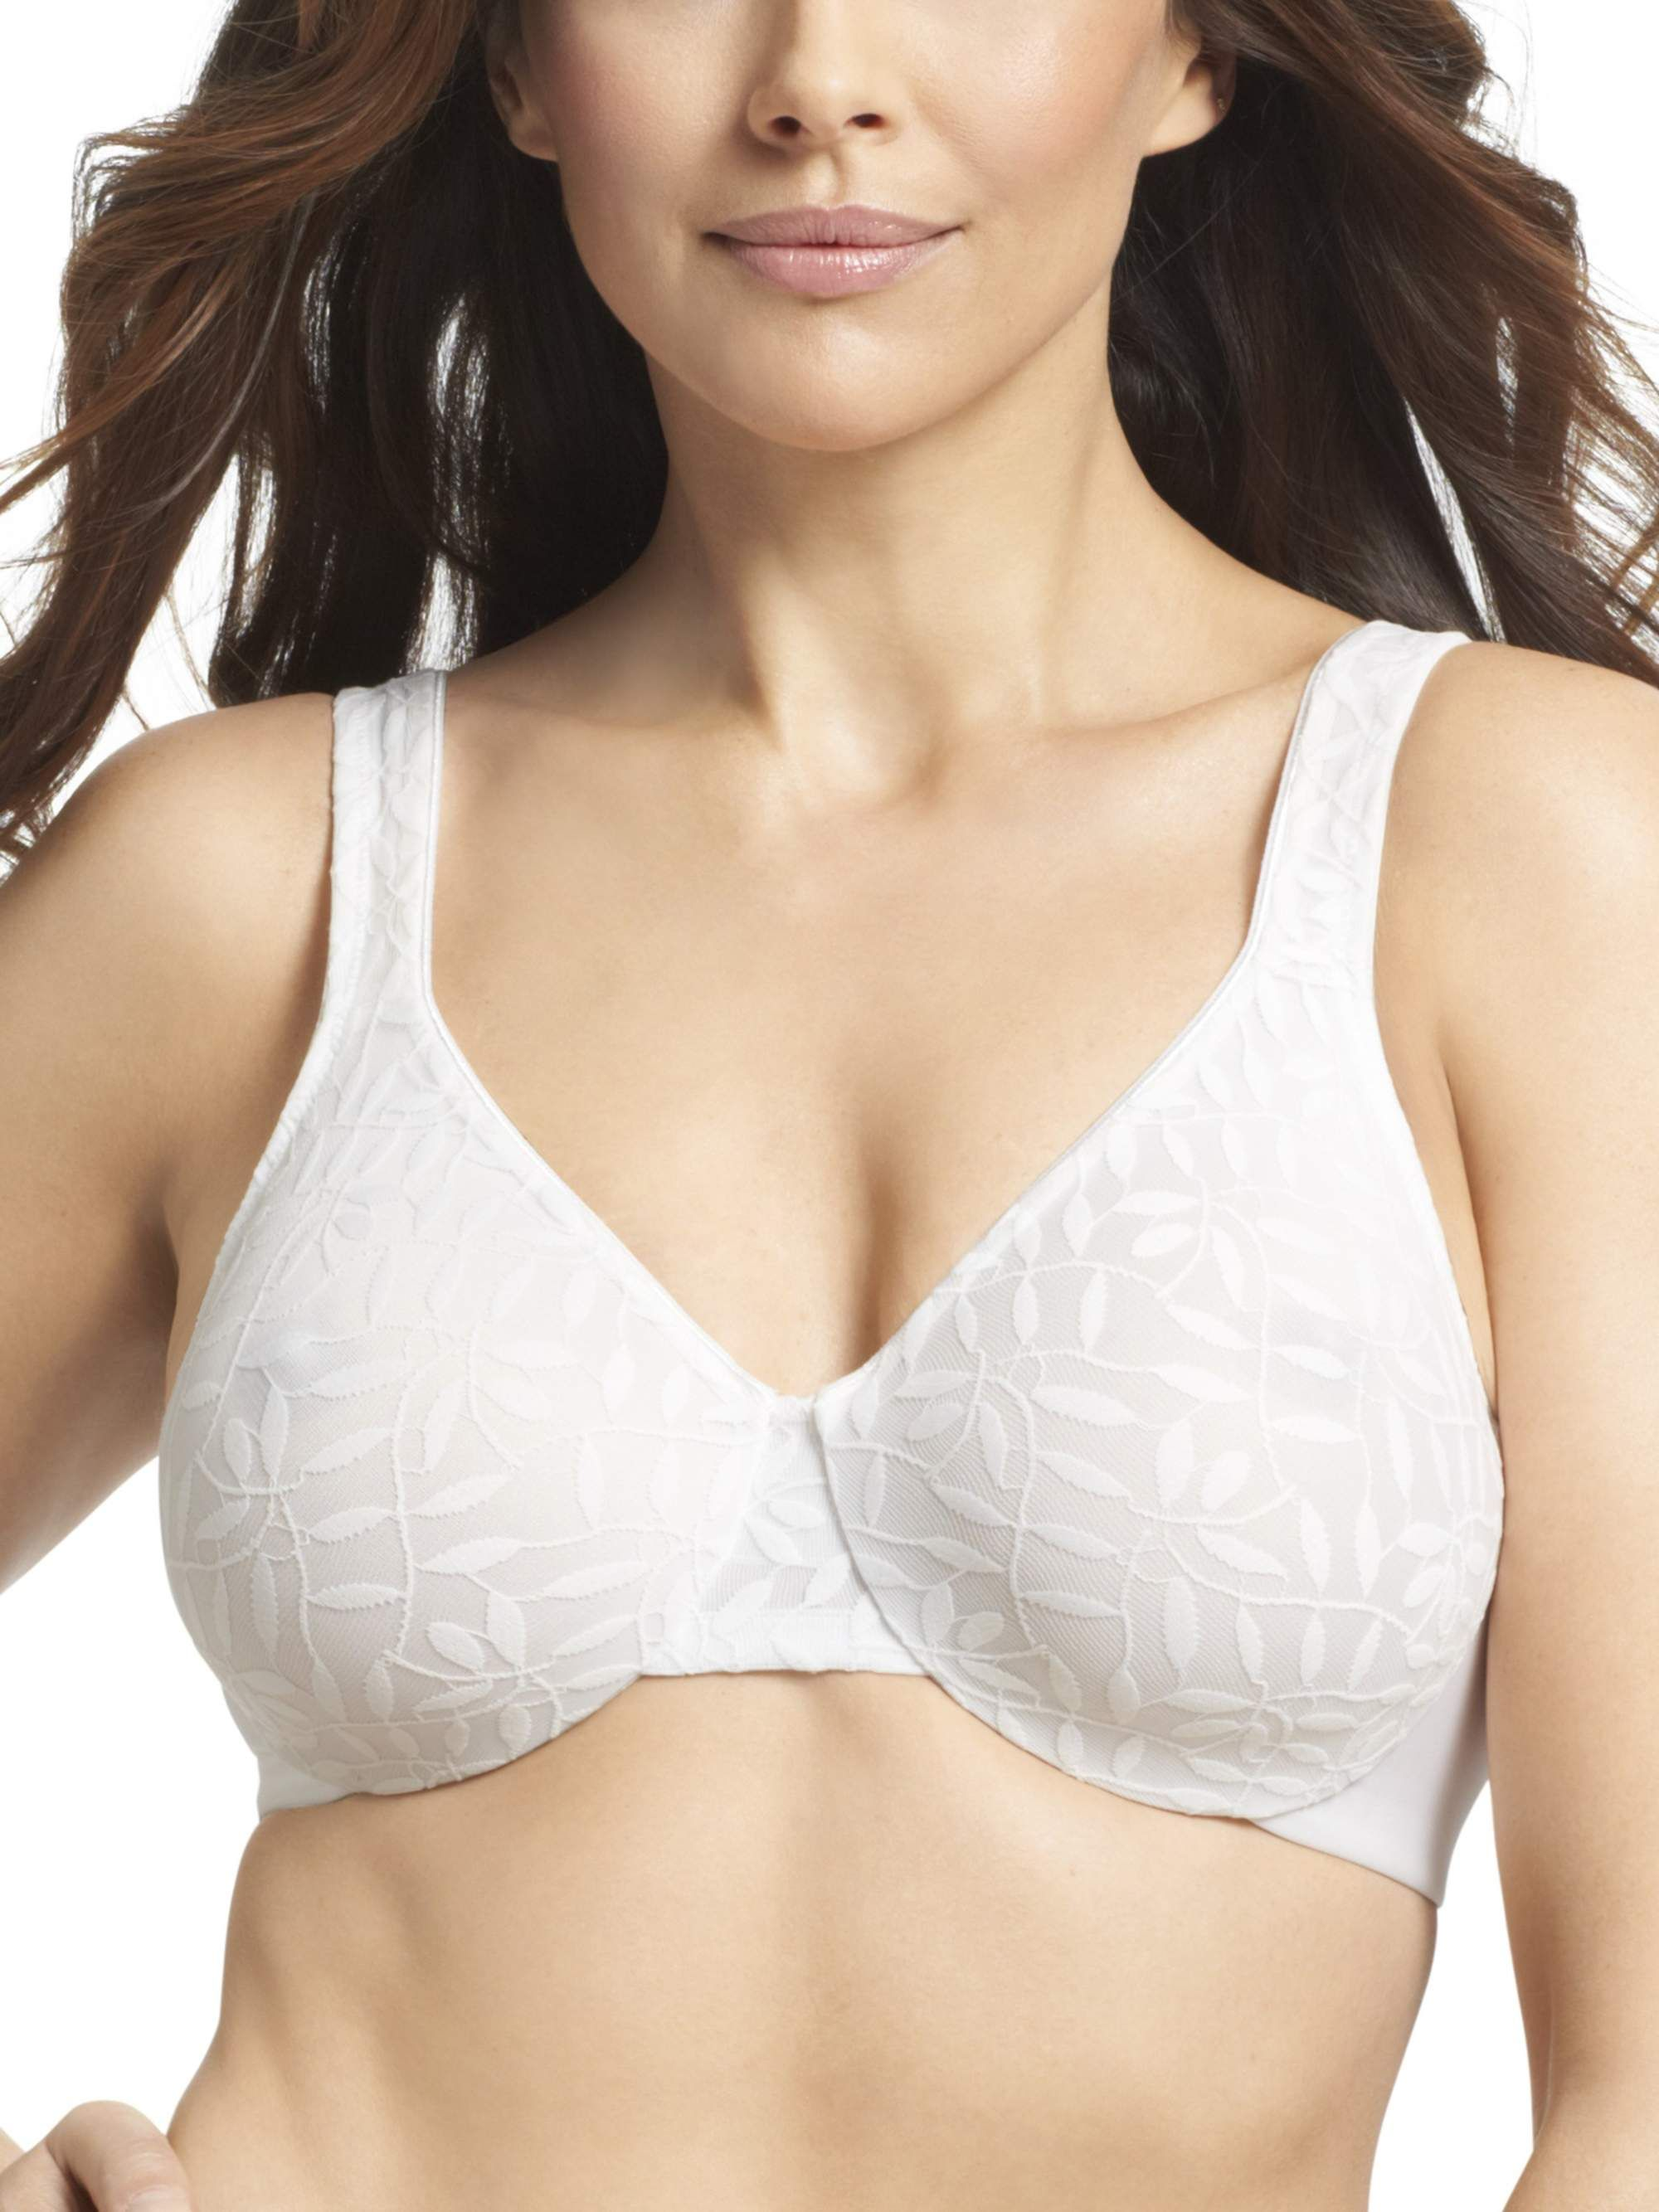 ca42c93631 Women s Plus Lace Sheer Leaves Underwire Minimizer Bra